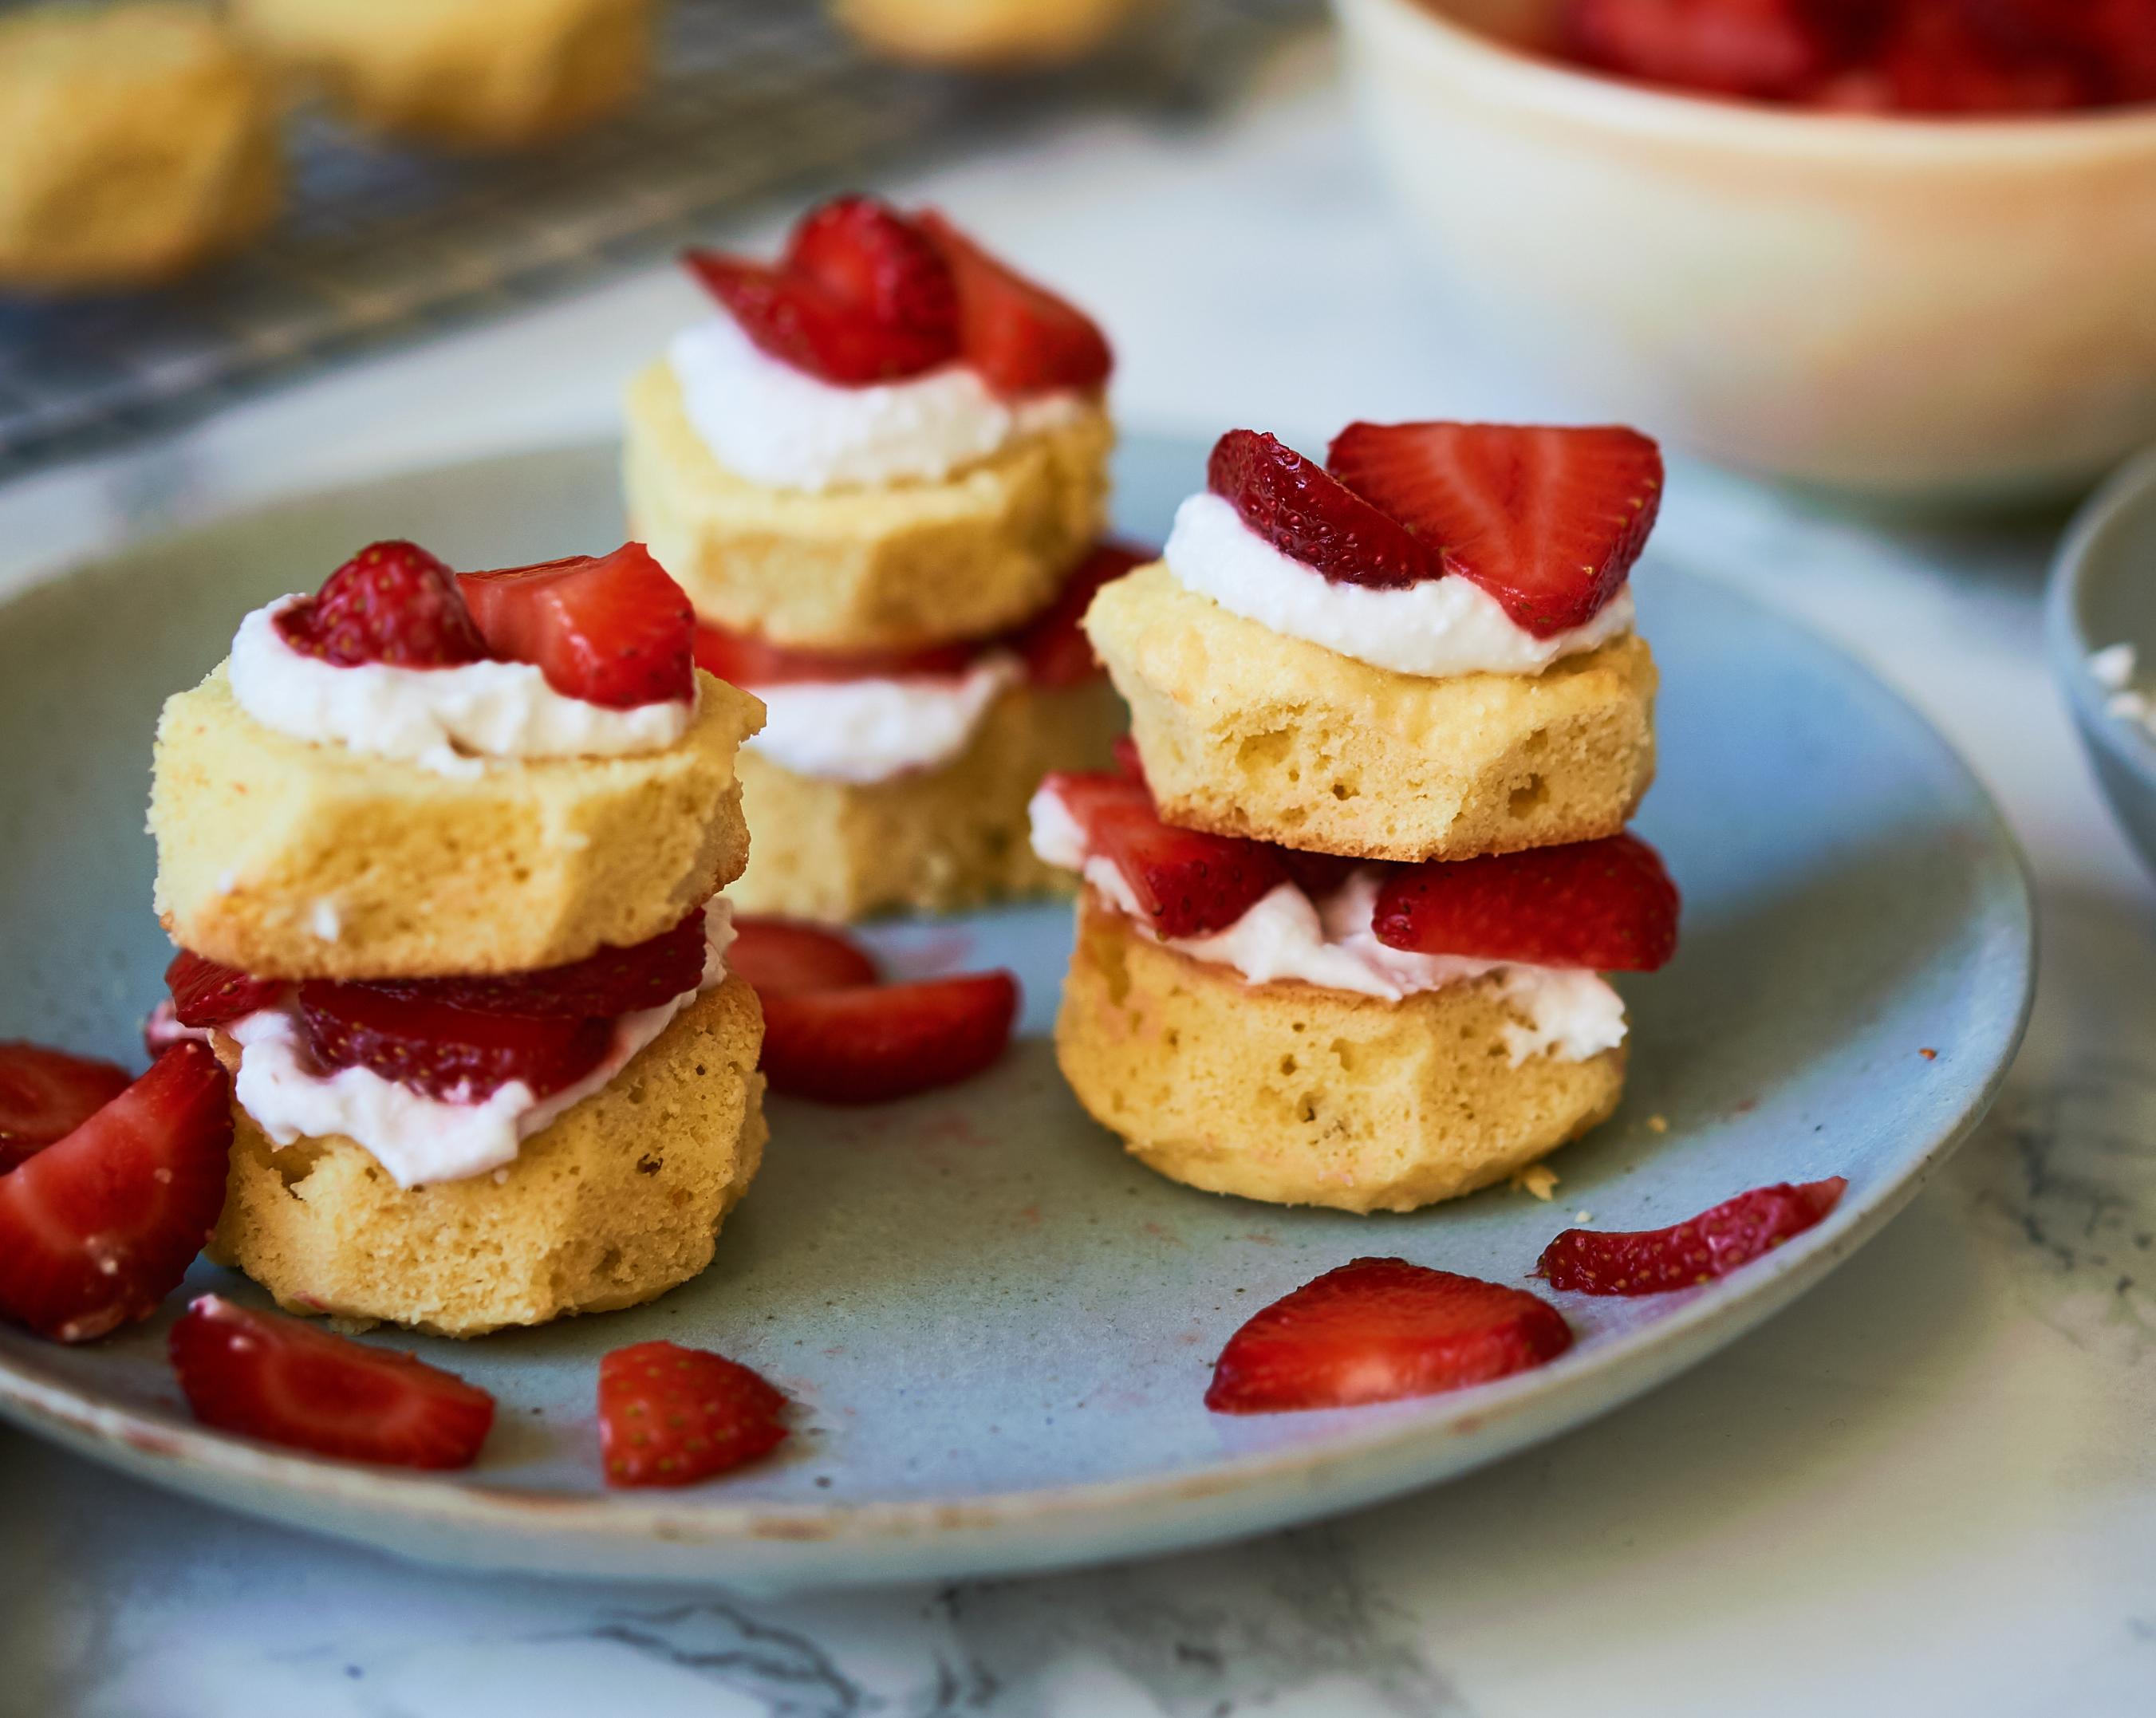 strawberry shortcake grain-free, gluten-free, sugar-free, paleo